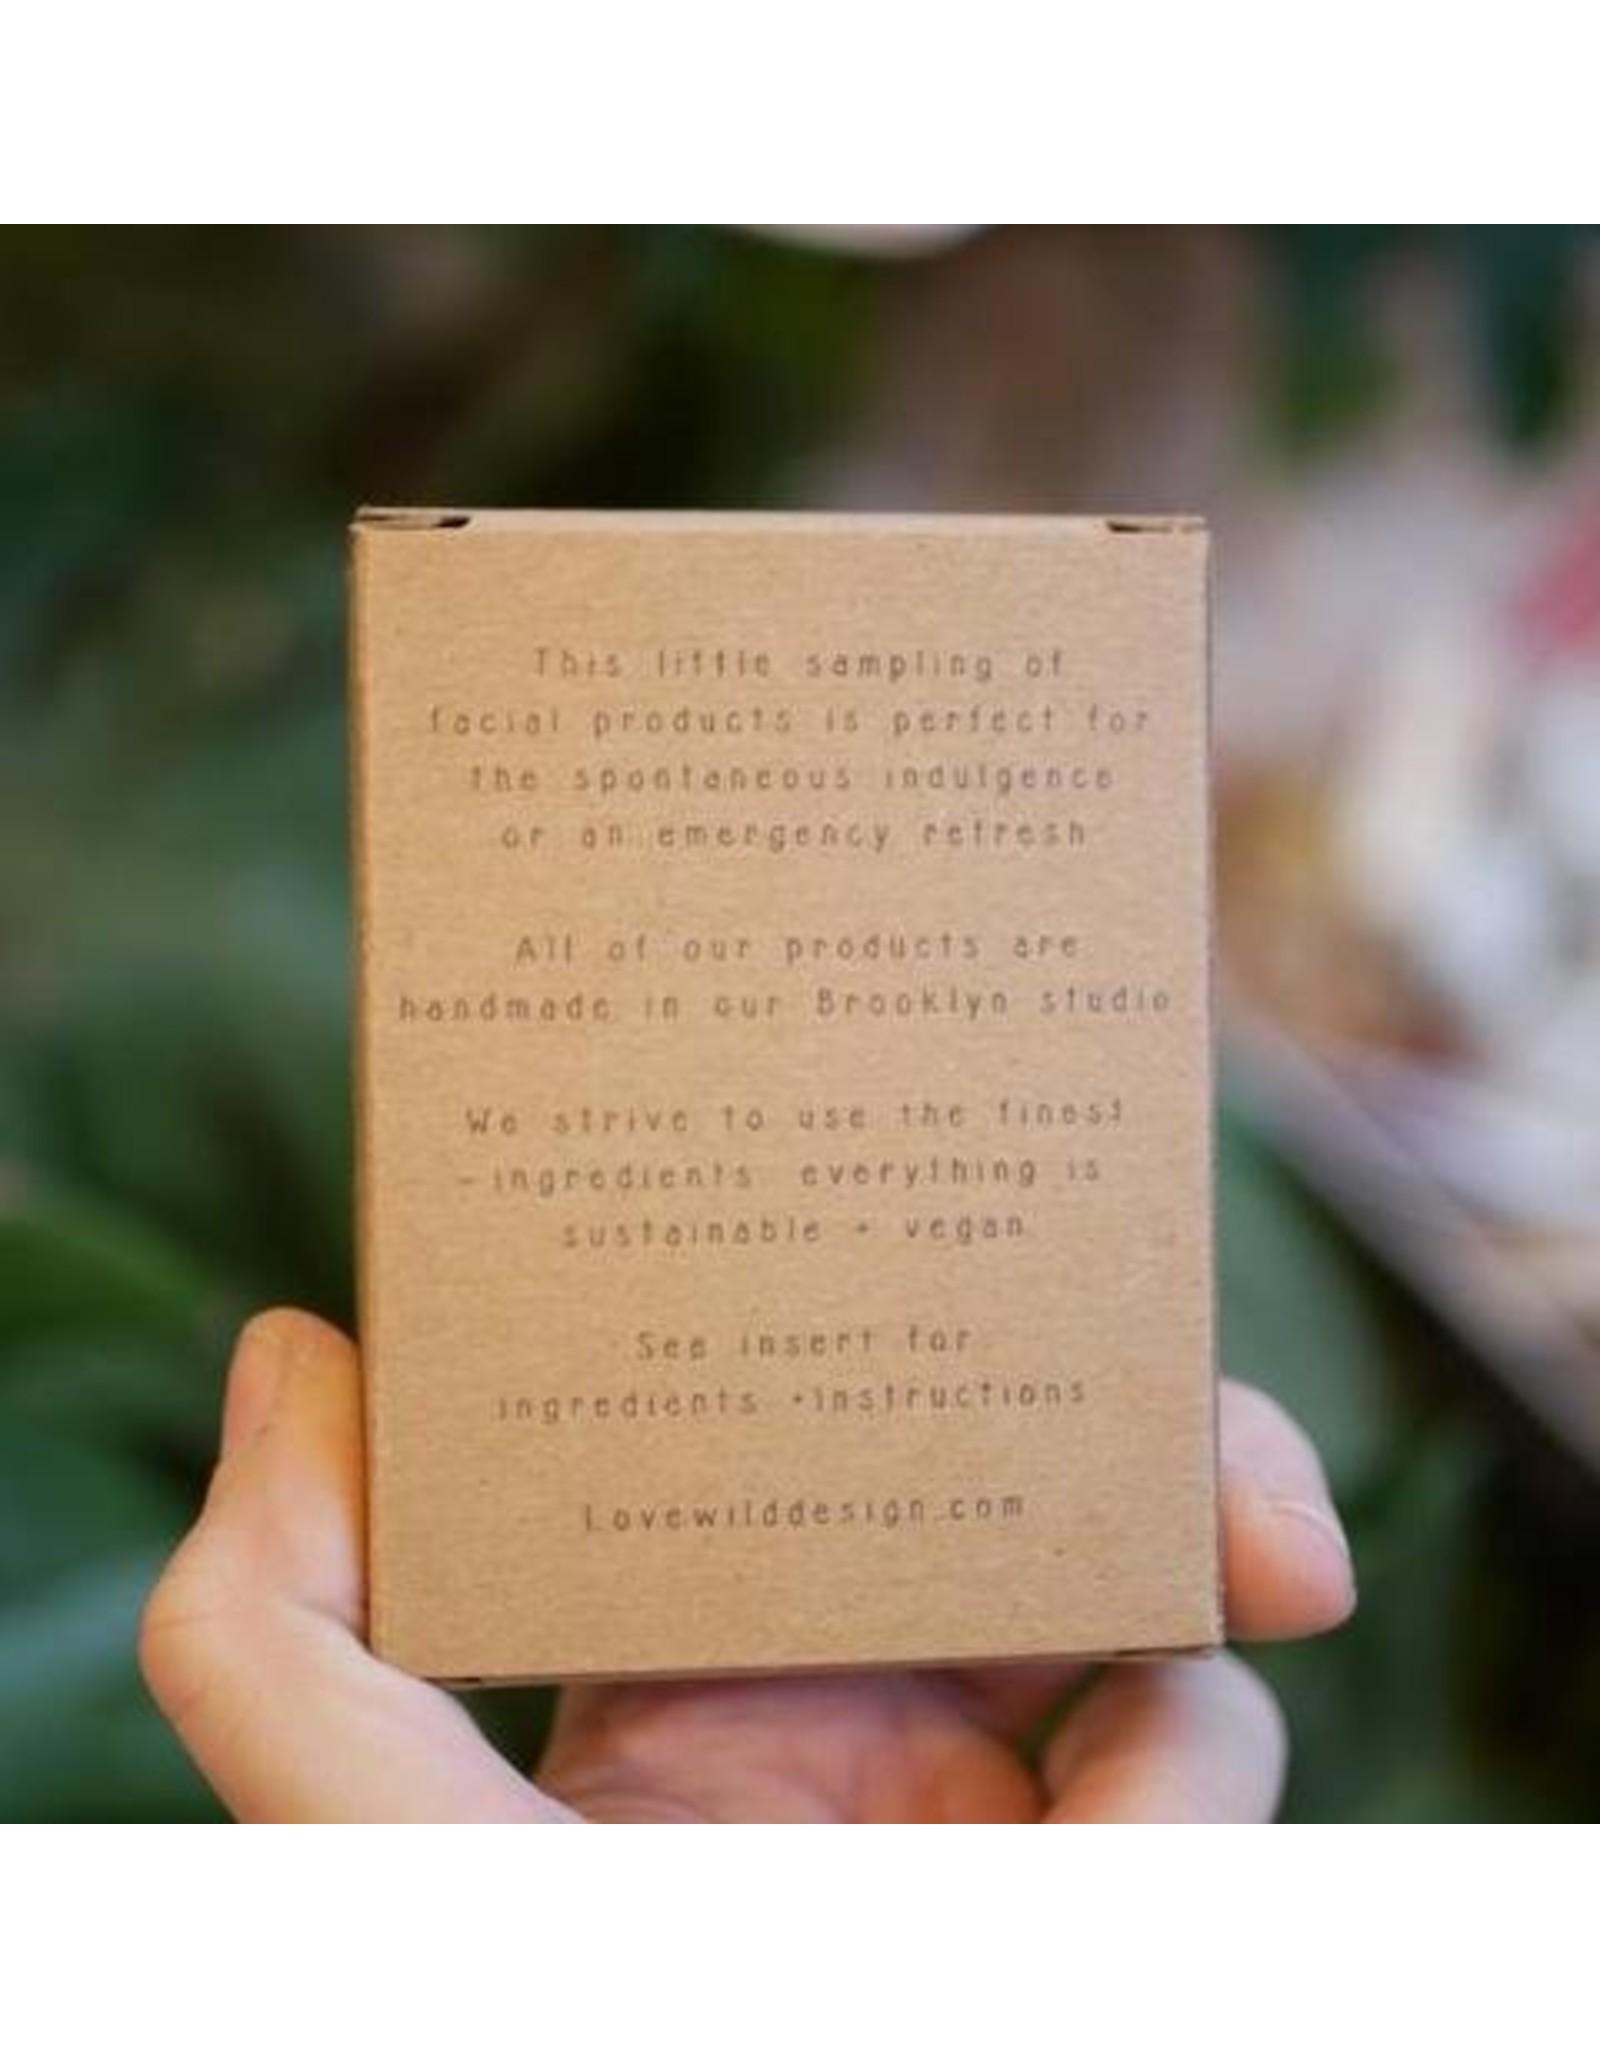 Lovewild Designs Mini Facial Kit